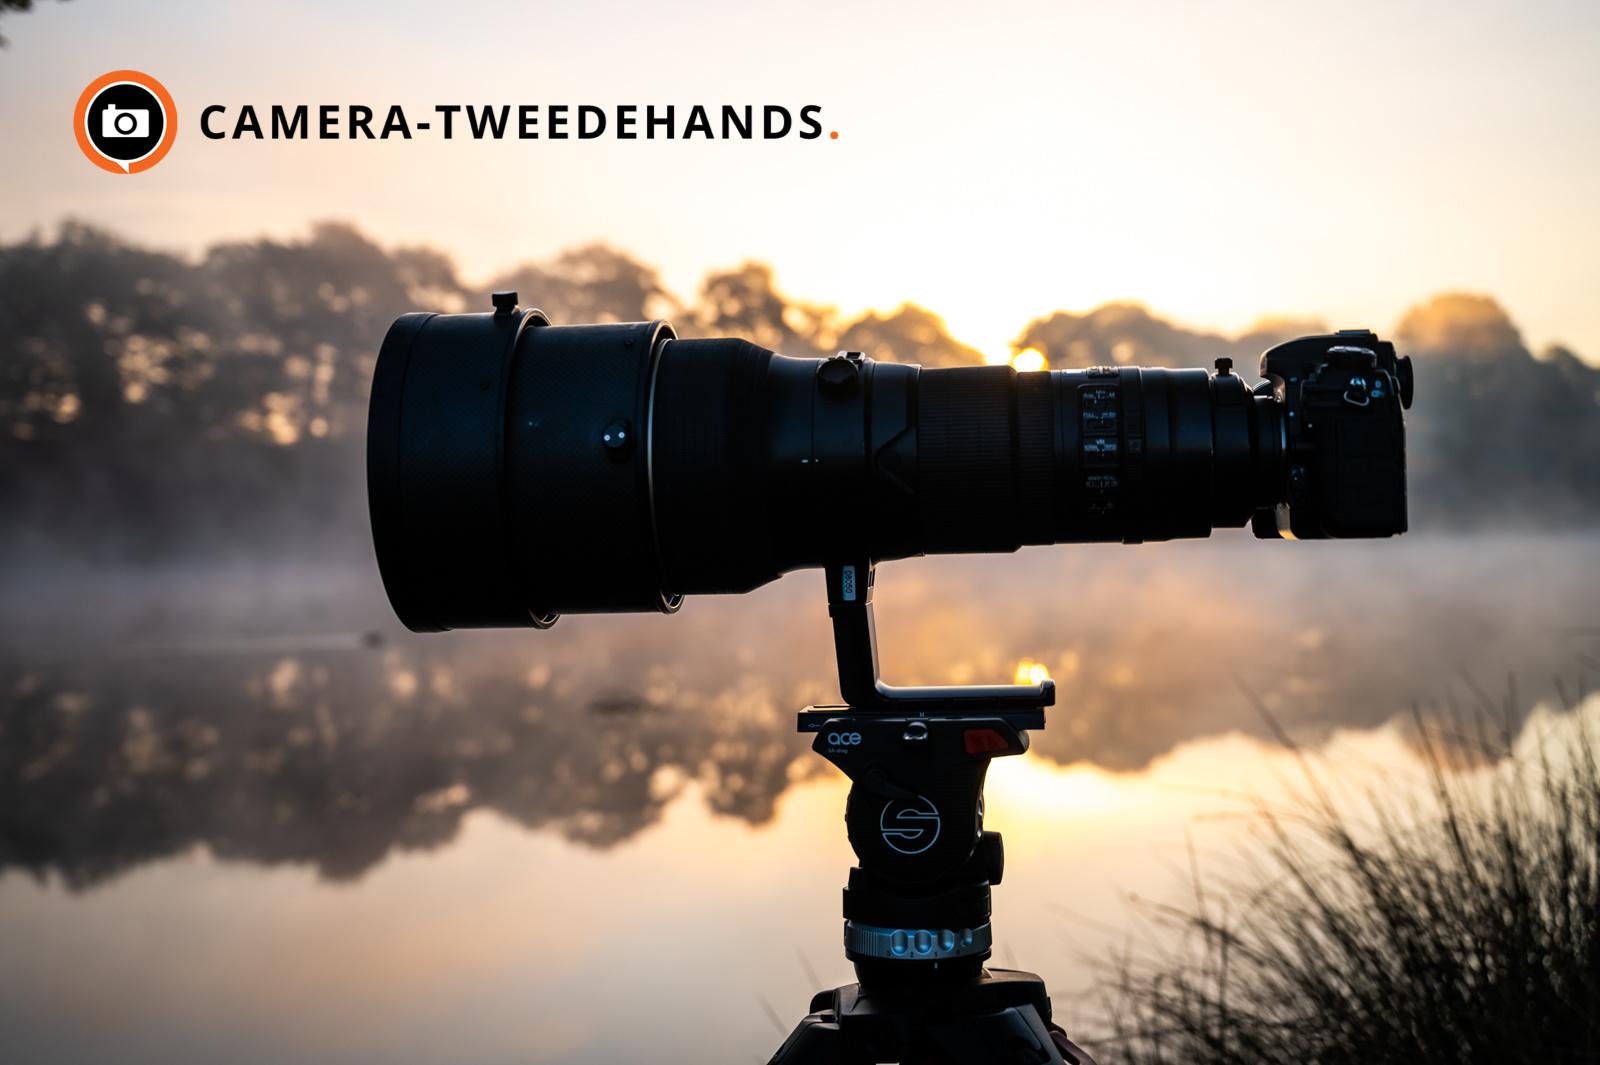 Natuurfotografie met de Nikon D500 + Nikon 400mm F/2.8 G AF-S ED VR II | Op pad met Jasper